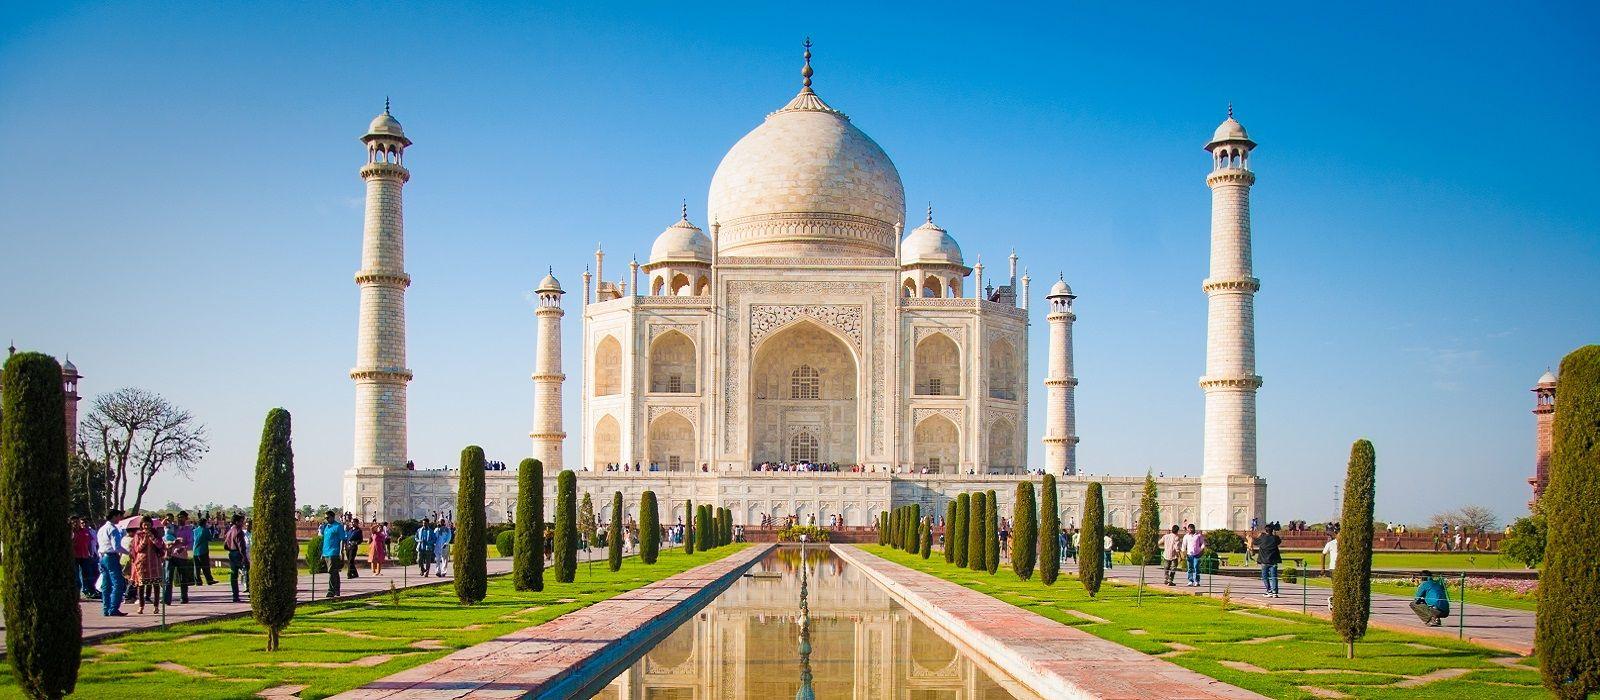 The Oberoi Hotels & Resorts Sommerangebot: Royales Rajasthan Urlaub 2